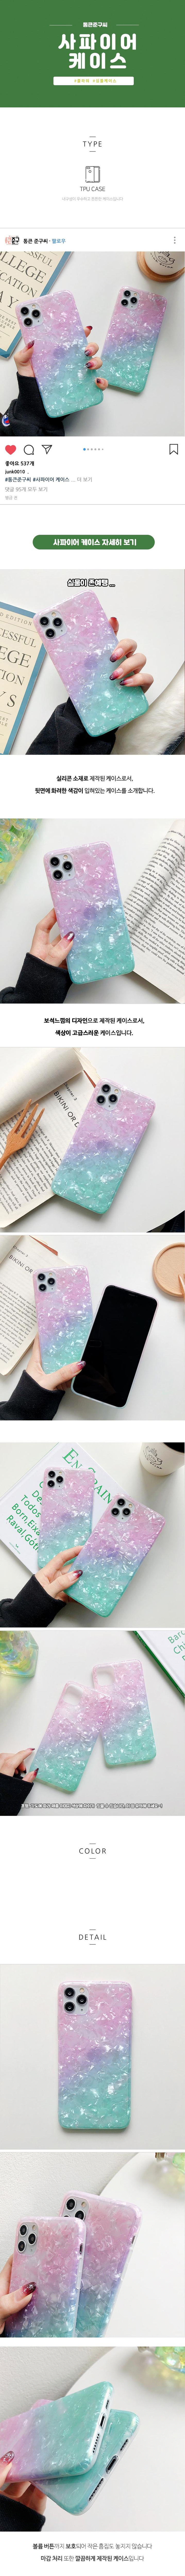 Tongkun Jungu iPhone 11 Pro Max iPhone XS iPhone XR iPhone 8 Sapphire Case